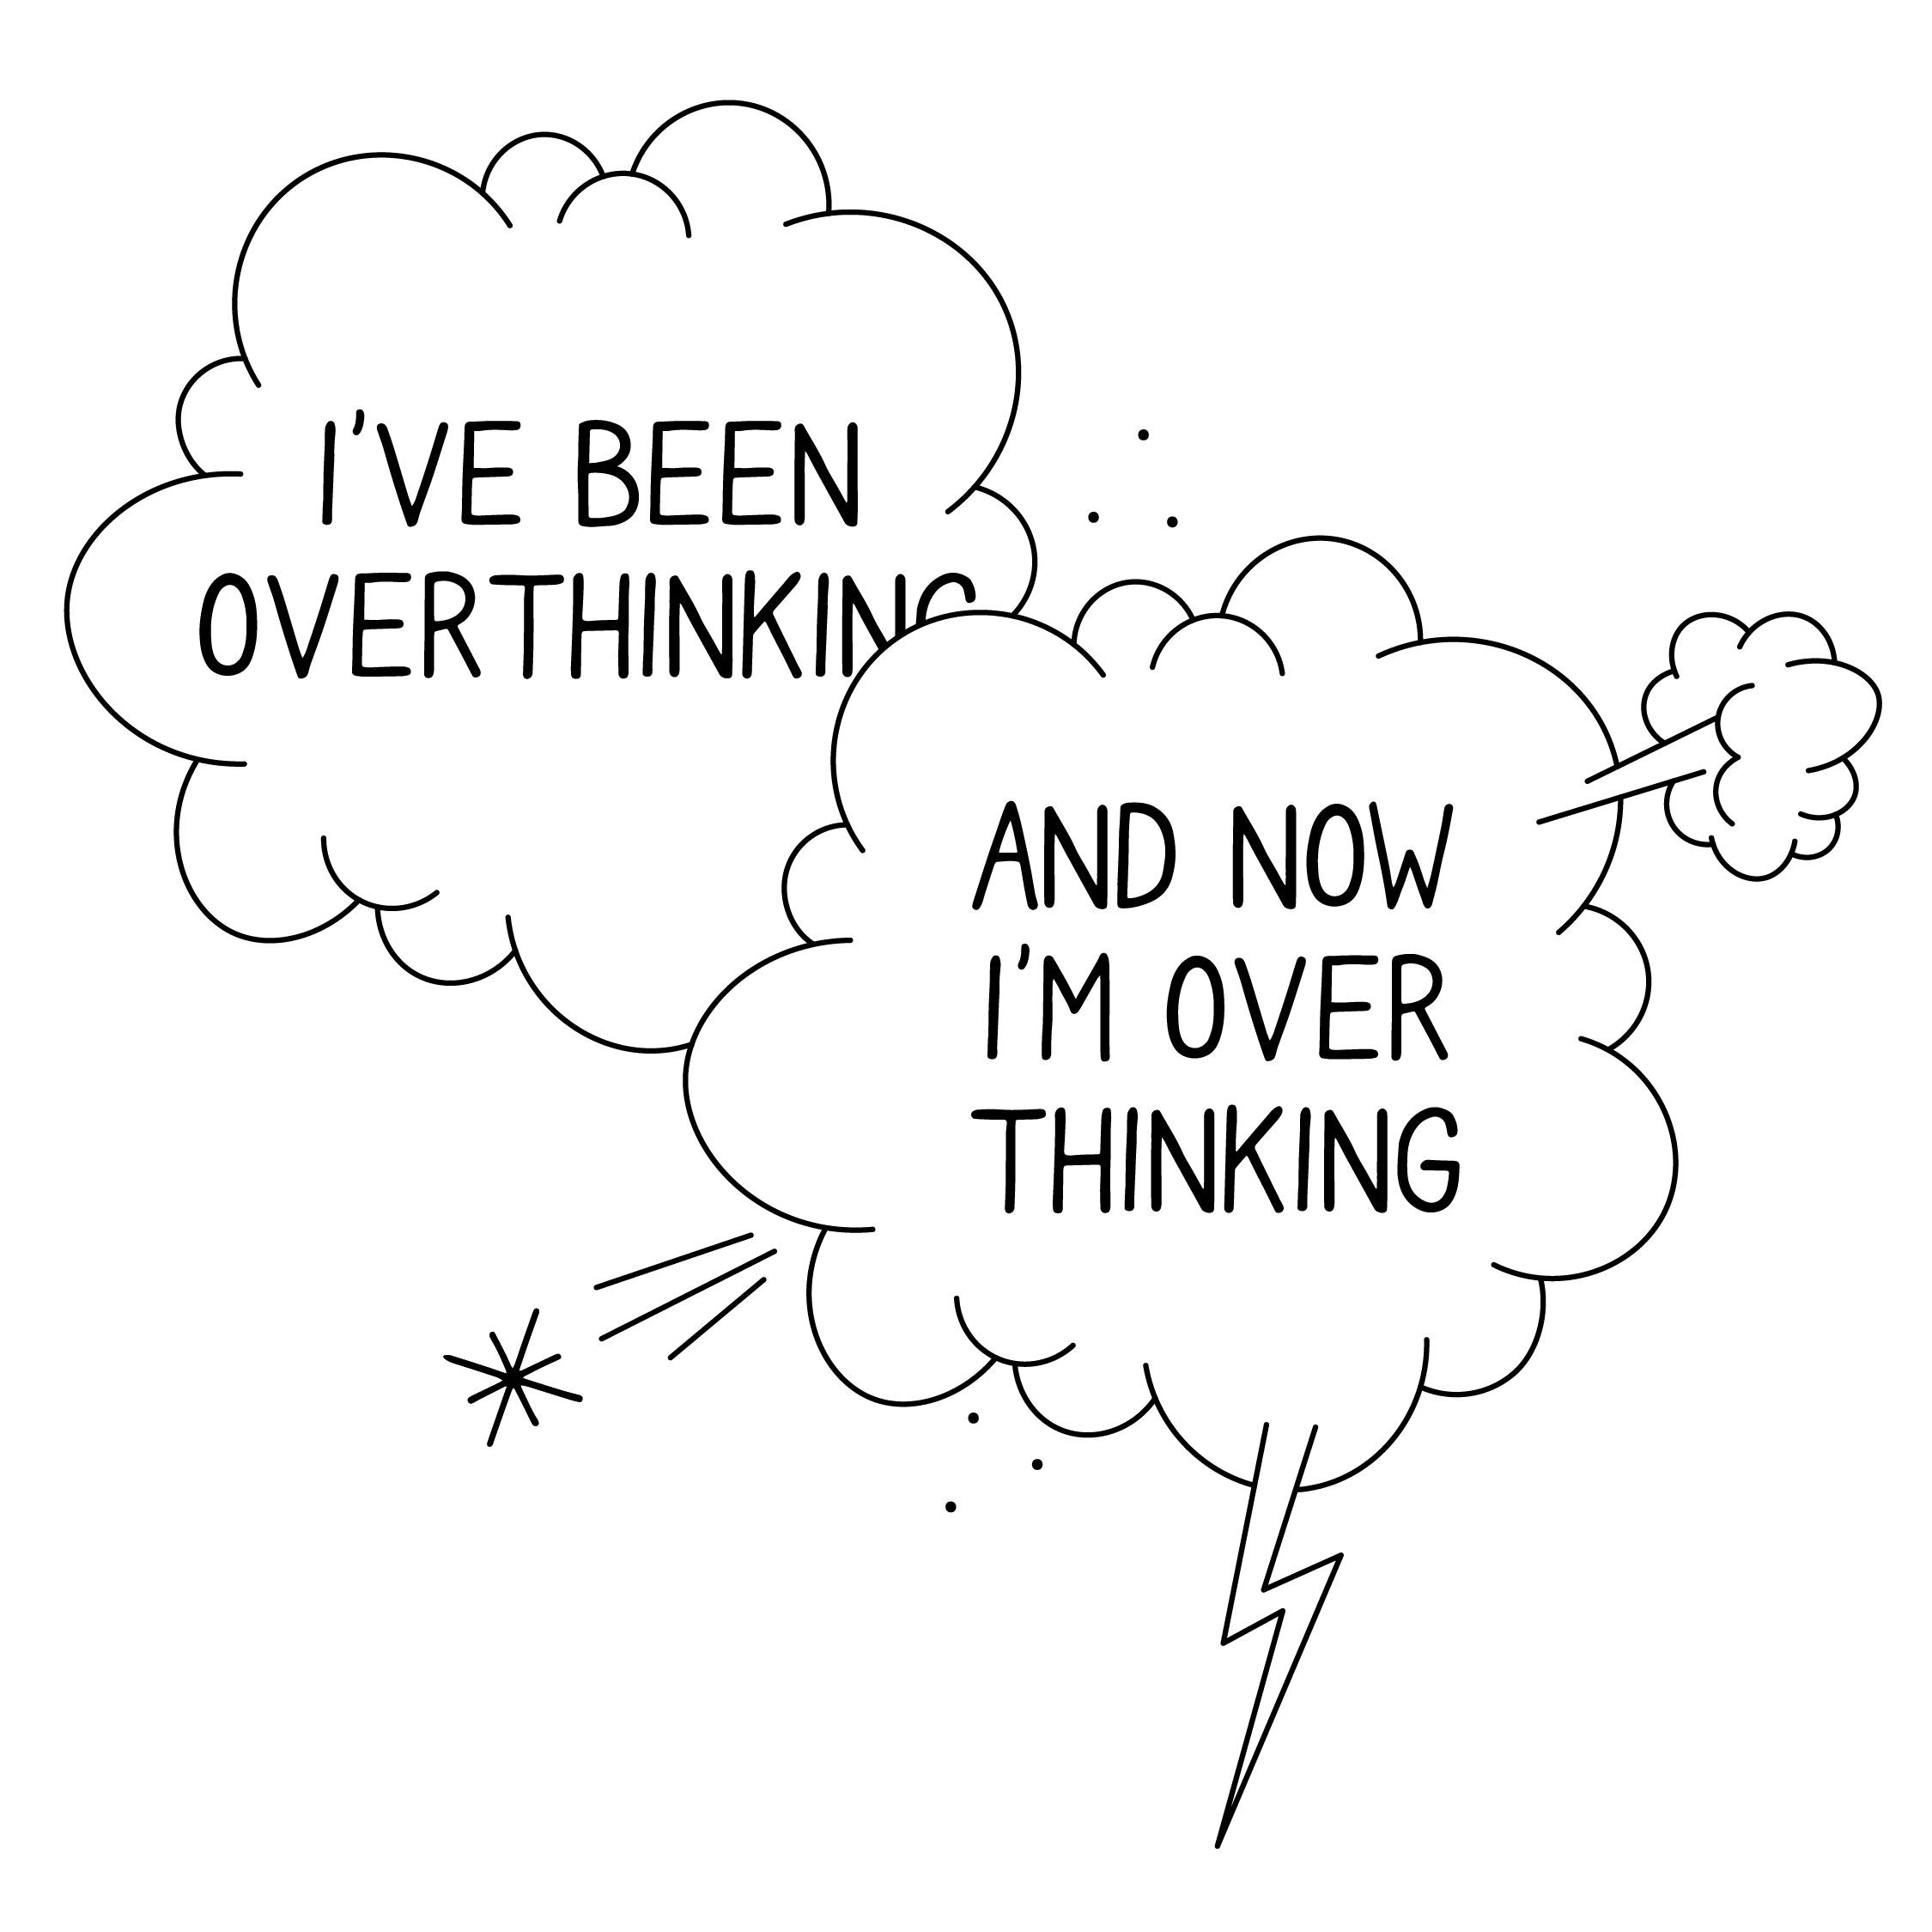 overthinking-01.jpg